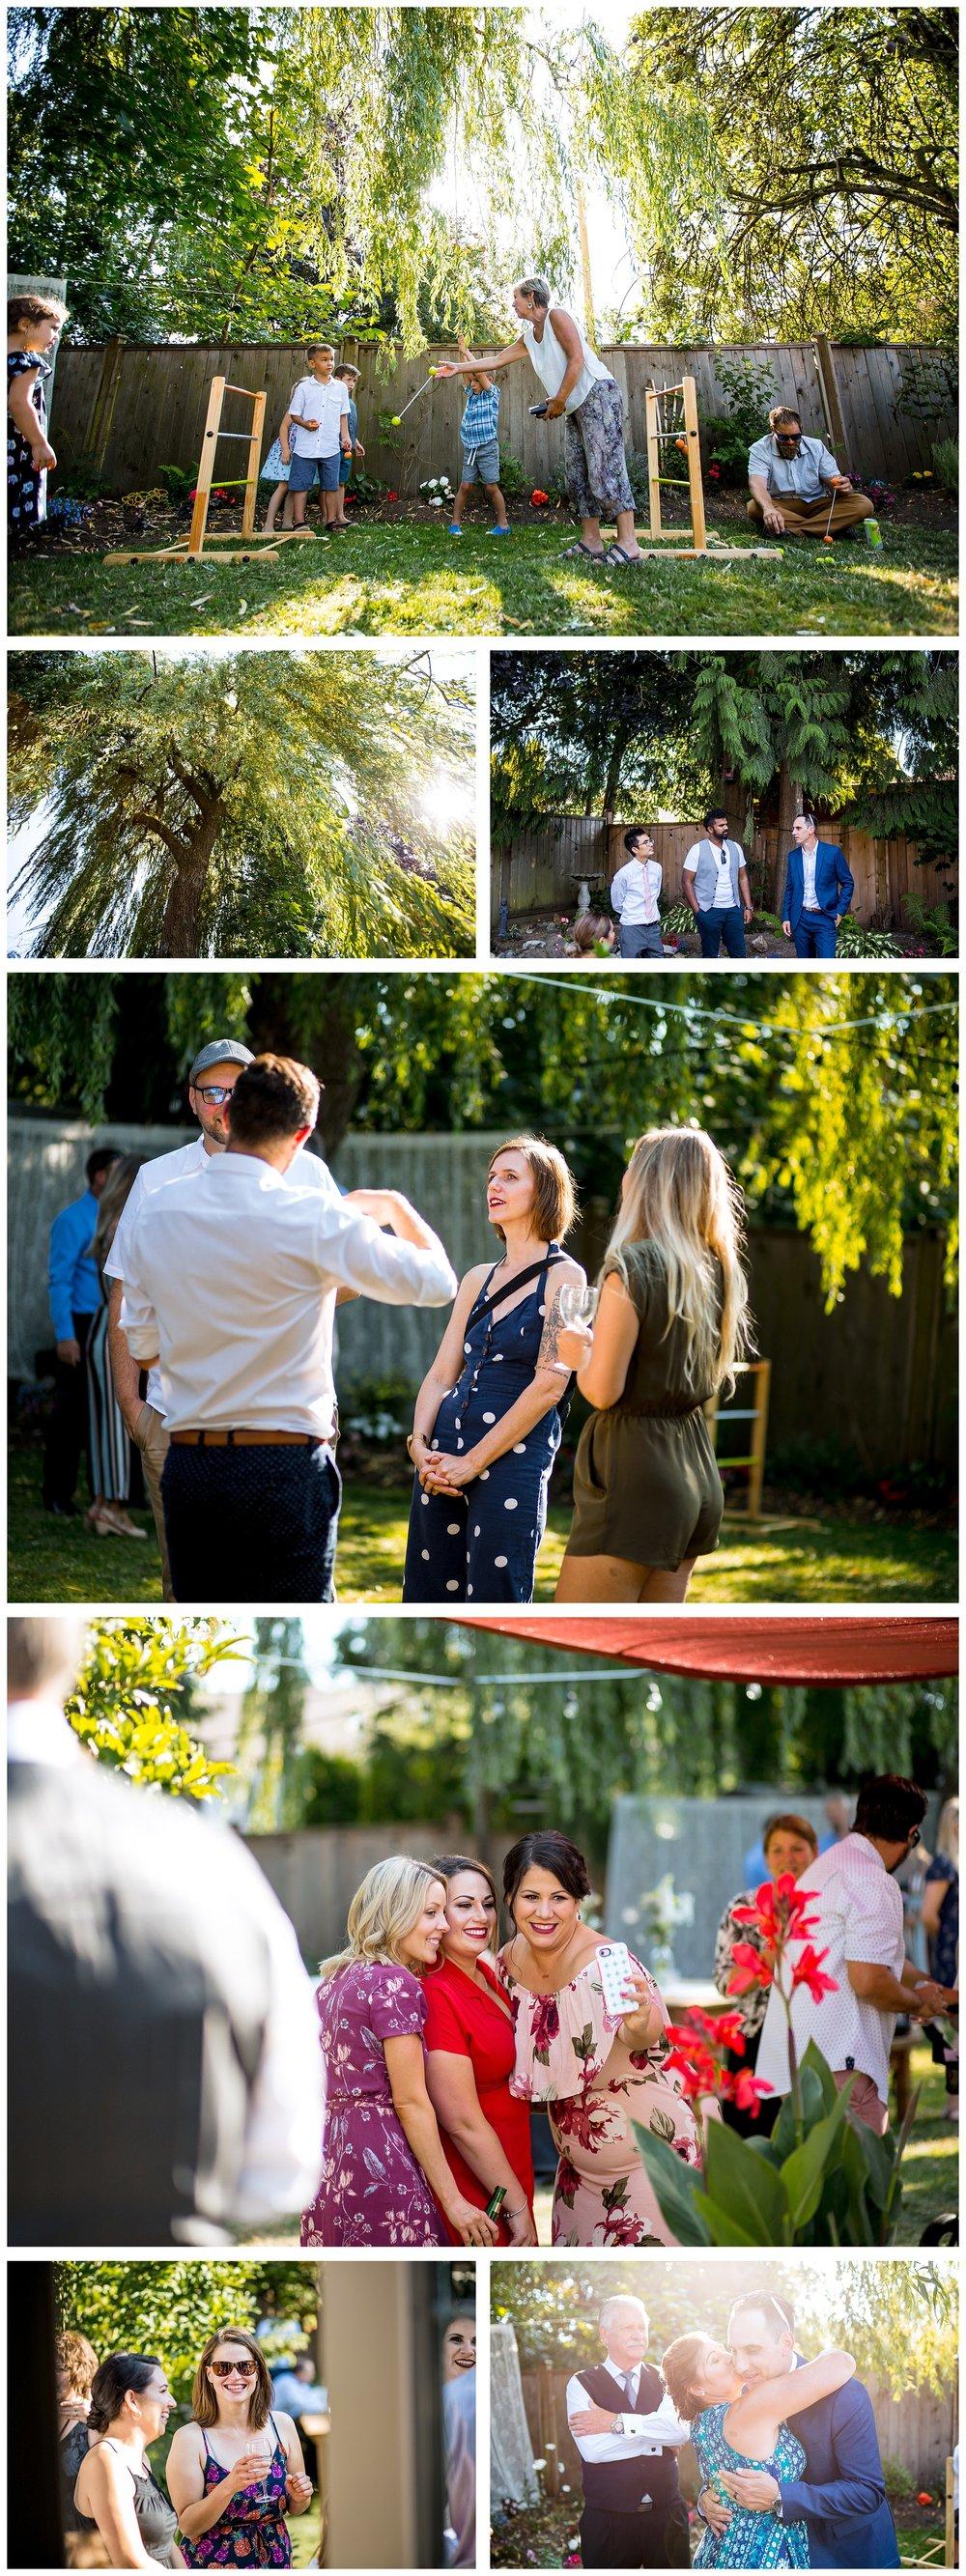 Aldergrove backyard summer wedding photographer bc canada outdoor garden inspiration family couple with kids, bride and groom_0071.jpg